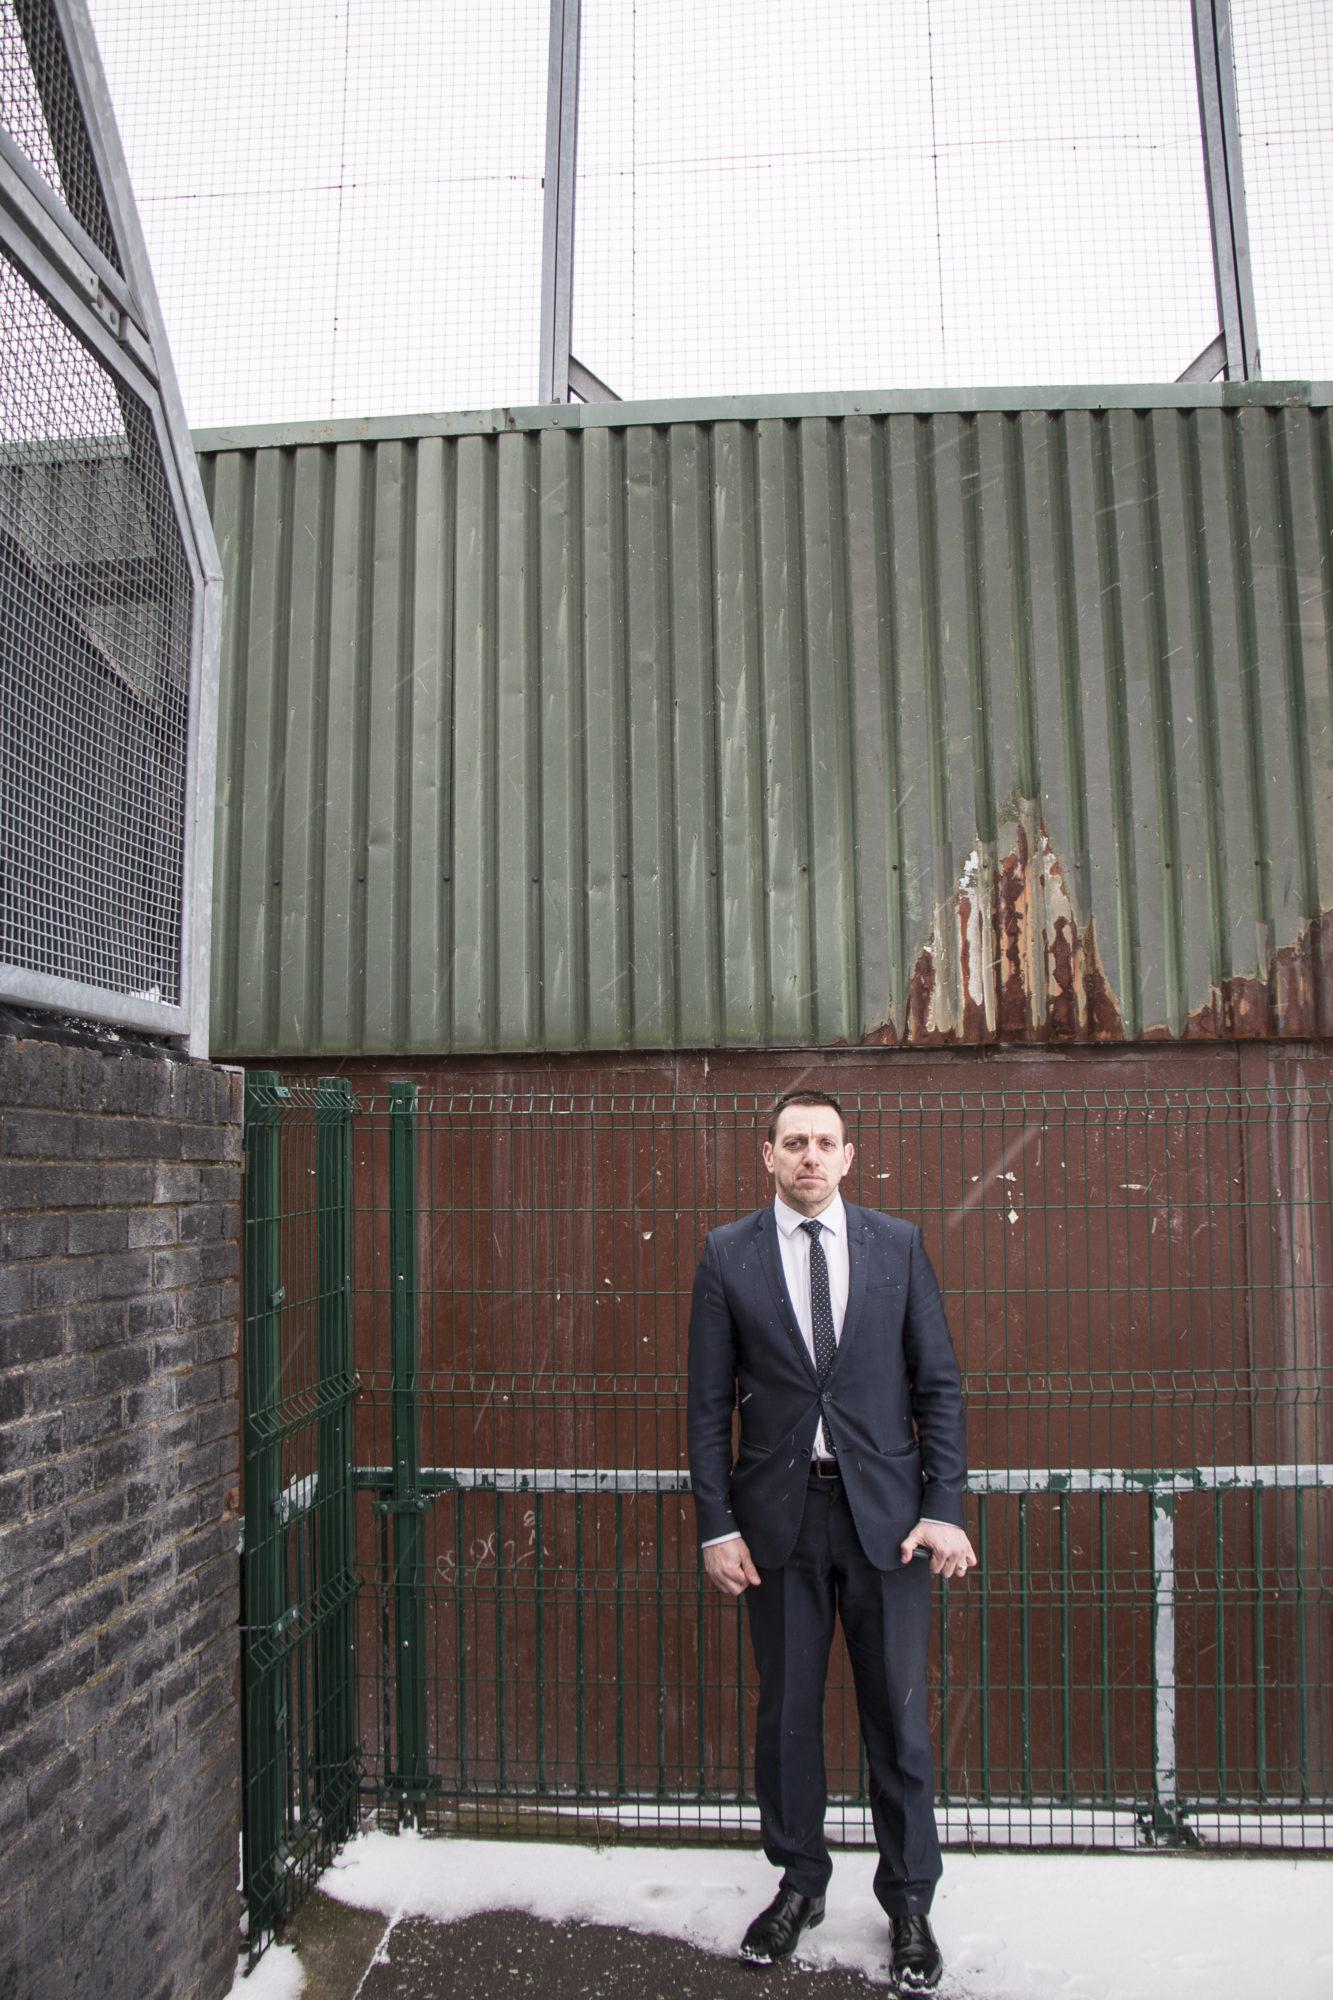 Padraig Ó Muirigh kasvoi kahdeksanmetrisen rauhanmuurin varjossa.